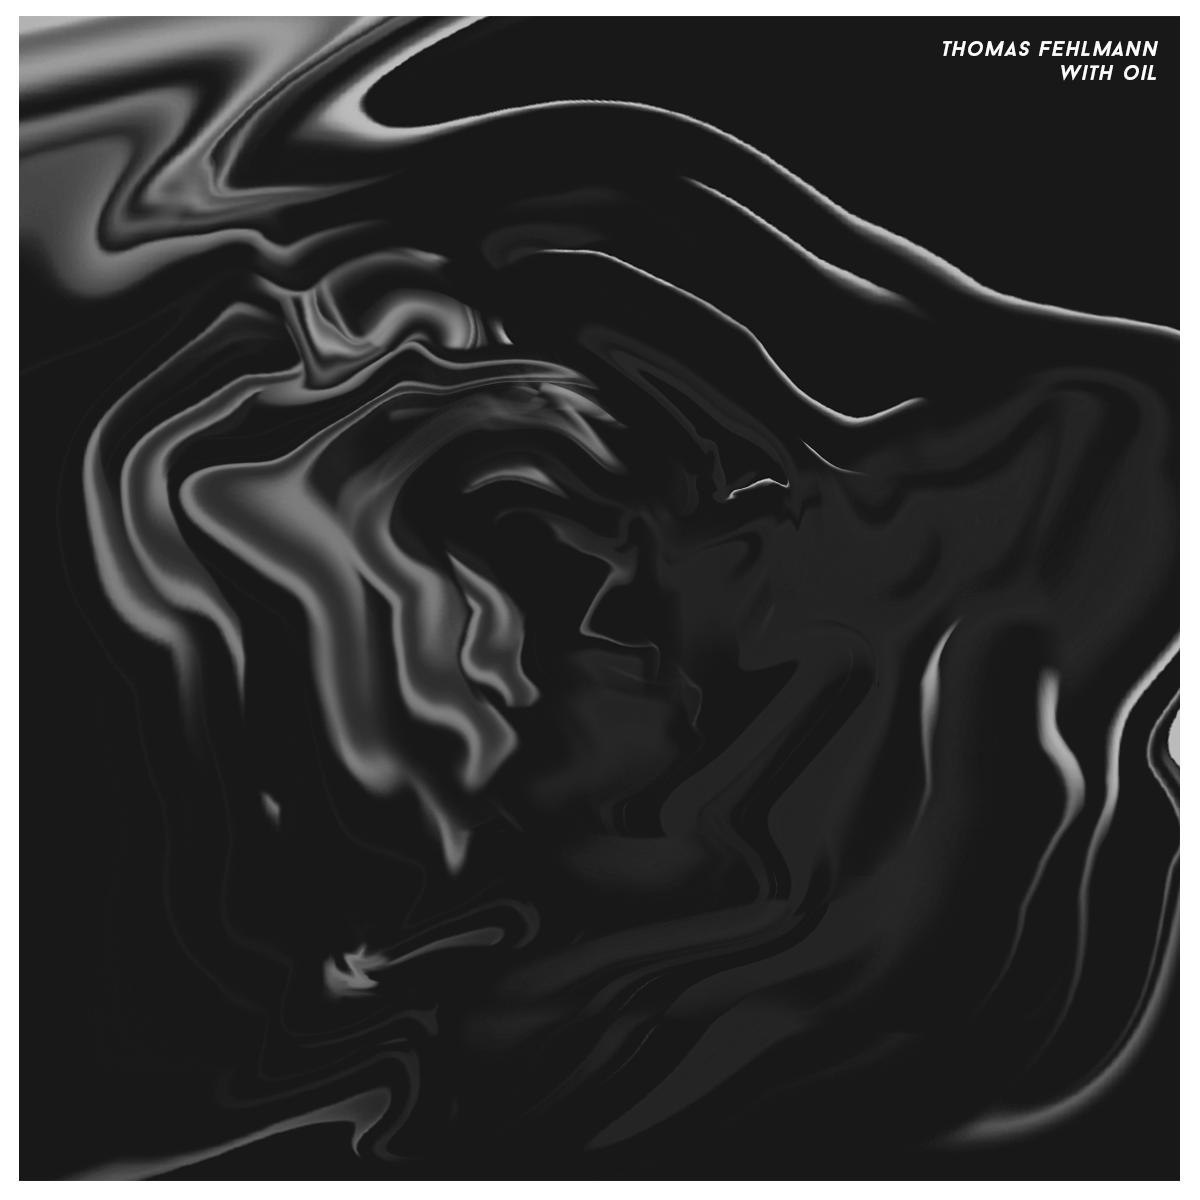 Kompakt K — THOMAS FEHLMANN - With oil audio link...